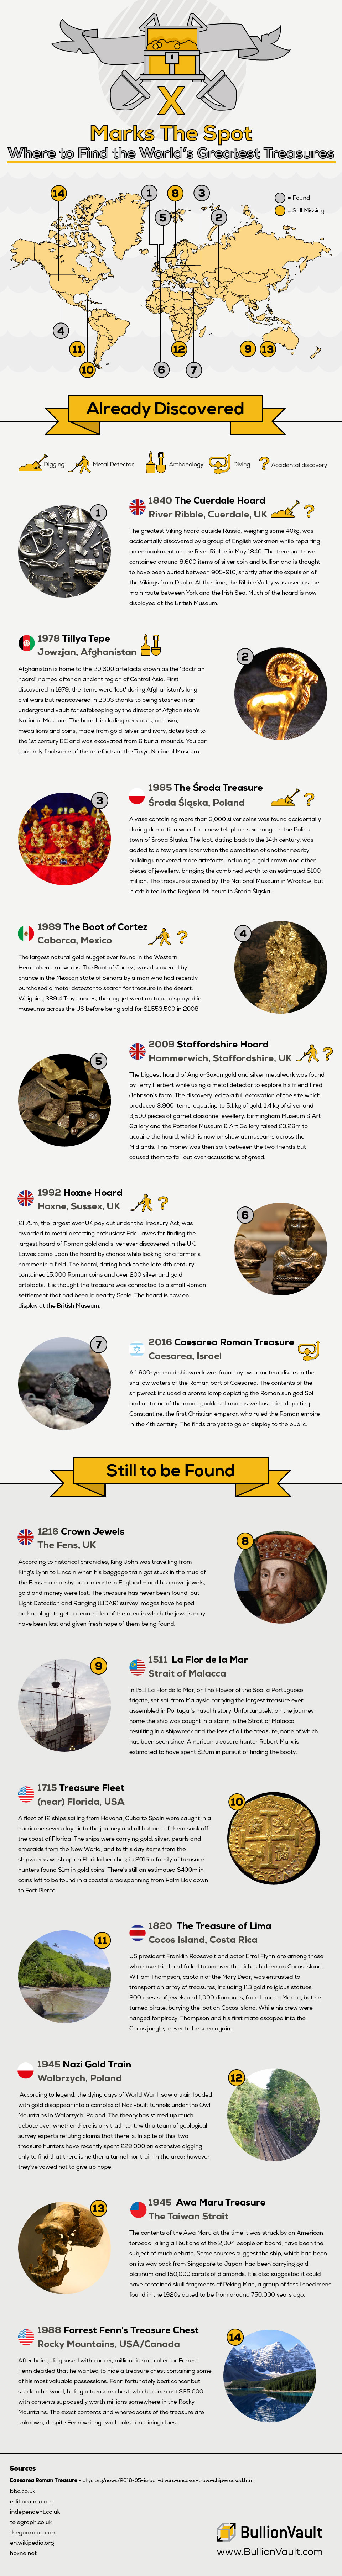 Treasure map infographic